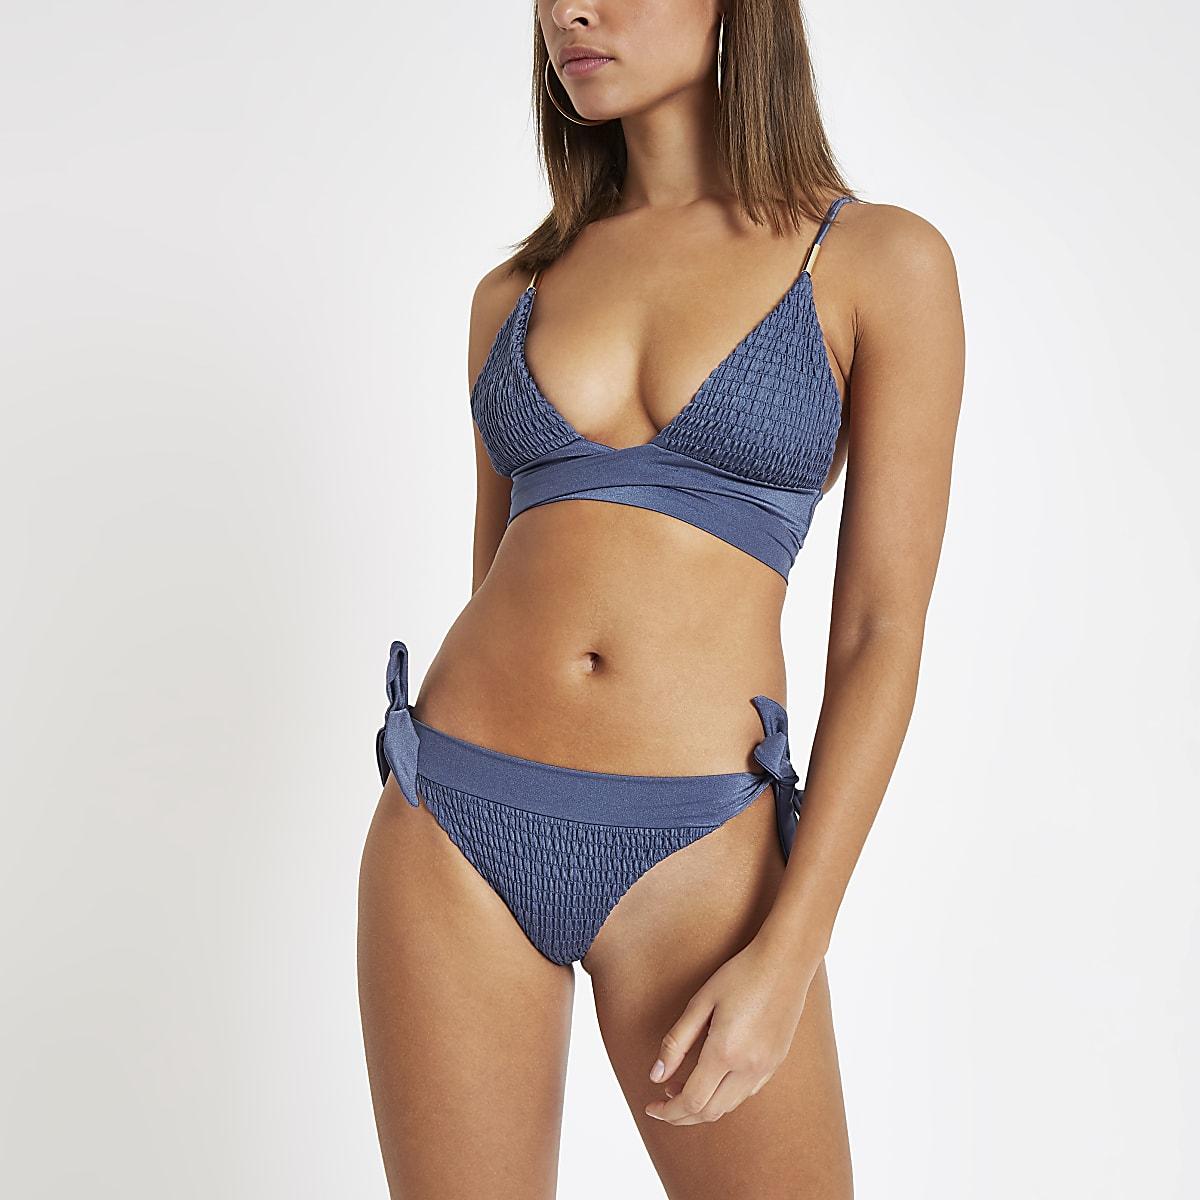 e0363ab11b2 Blue shirred tie front triangle bikini top - Bikini Tops - Bikinis -  Swimwear & Beachwear - women